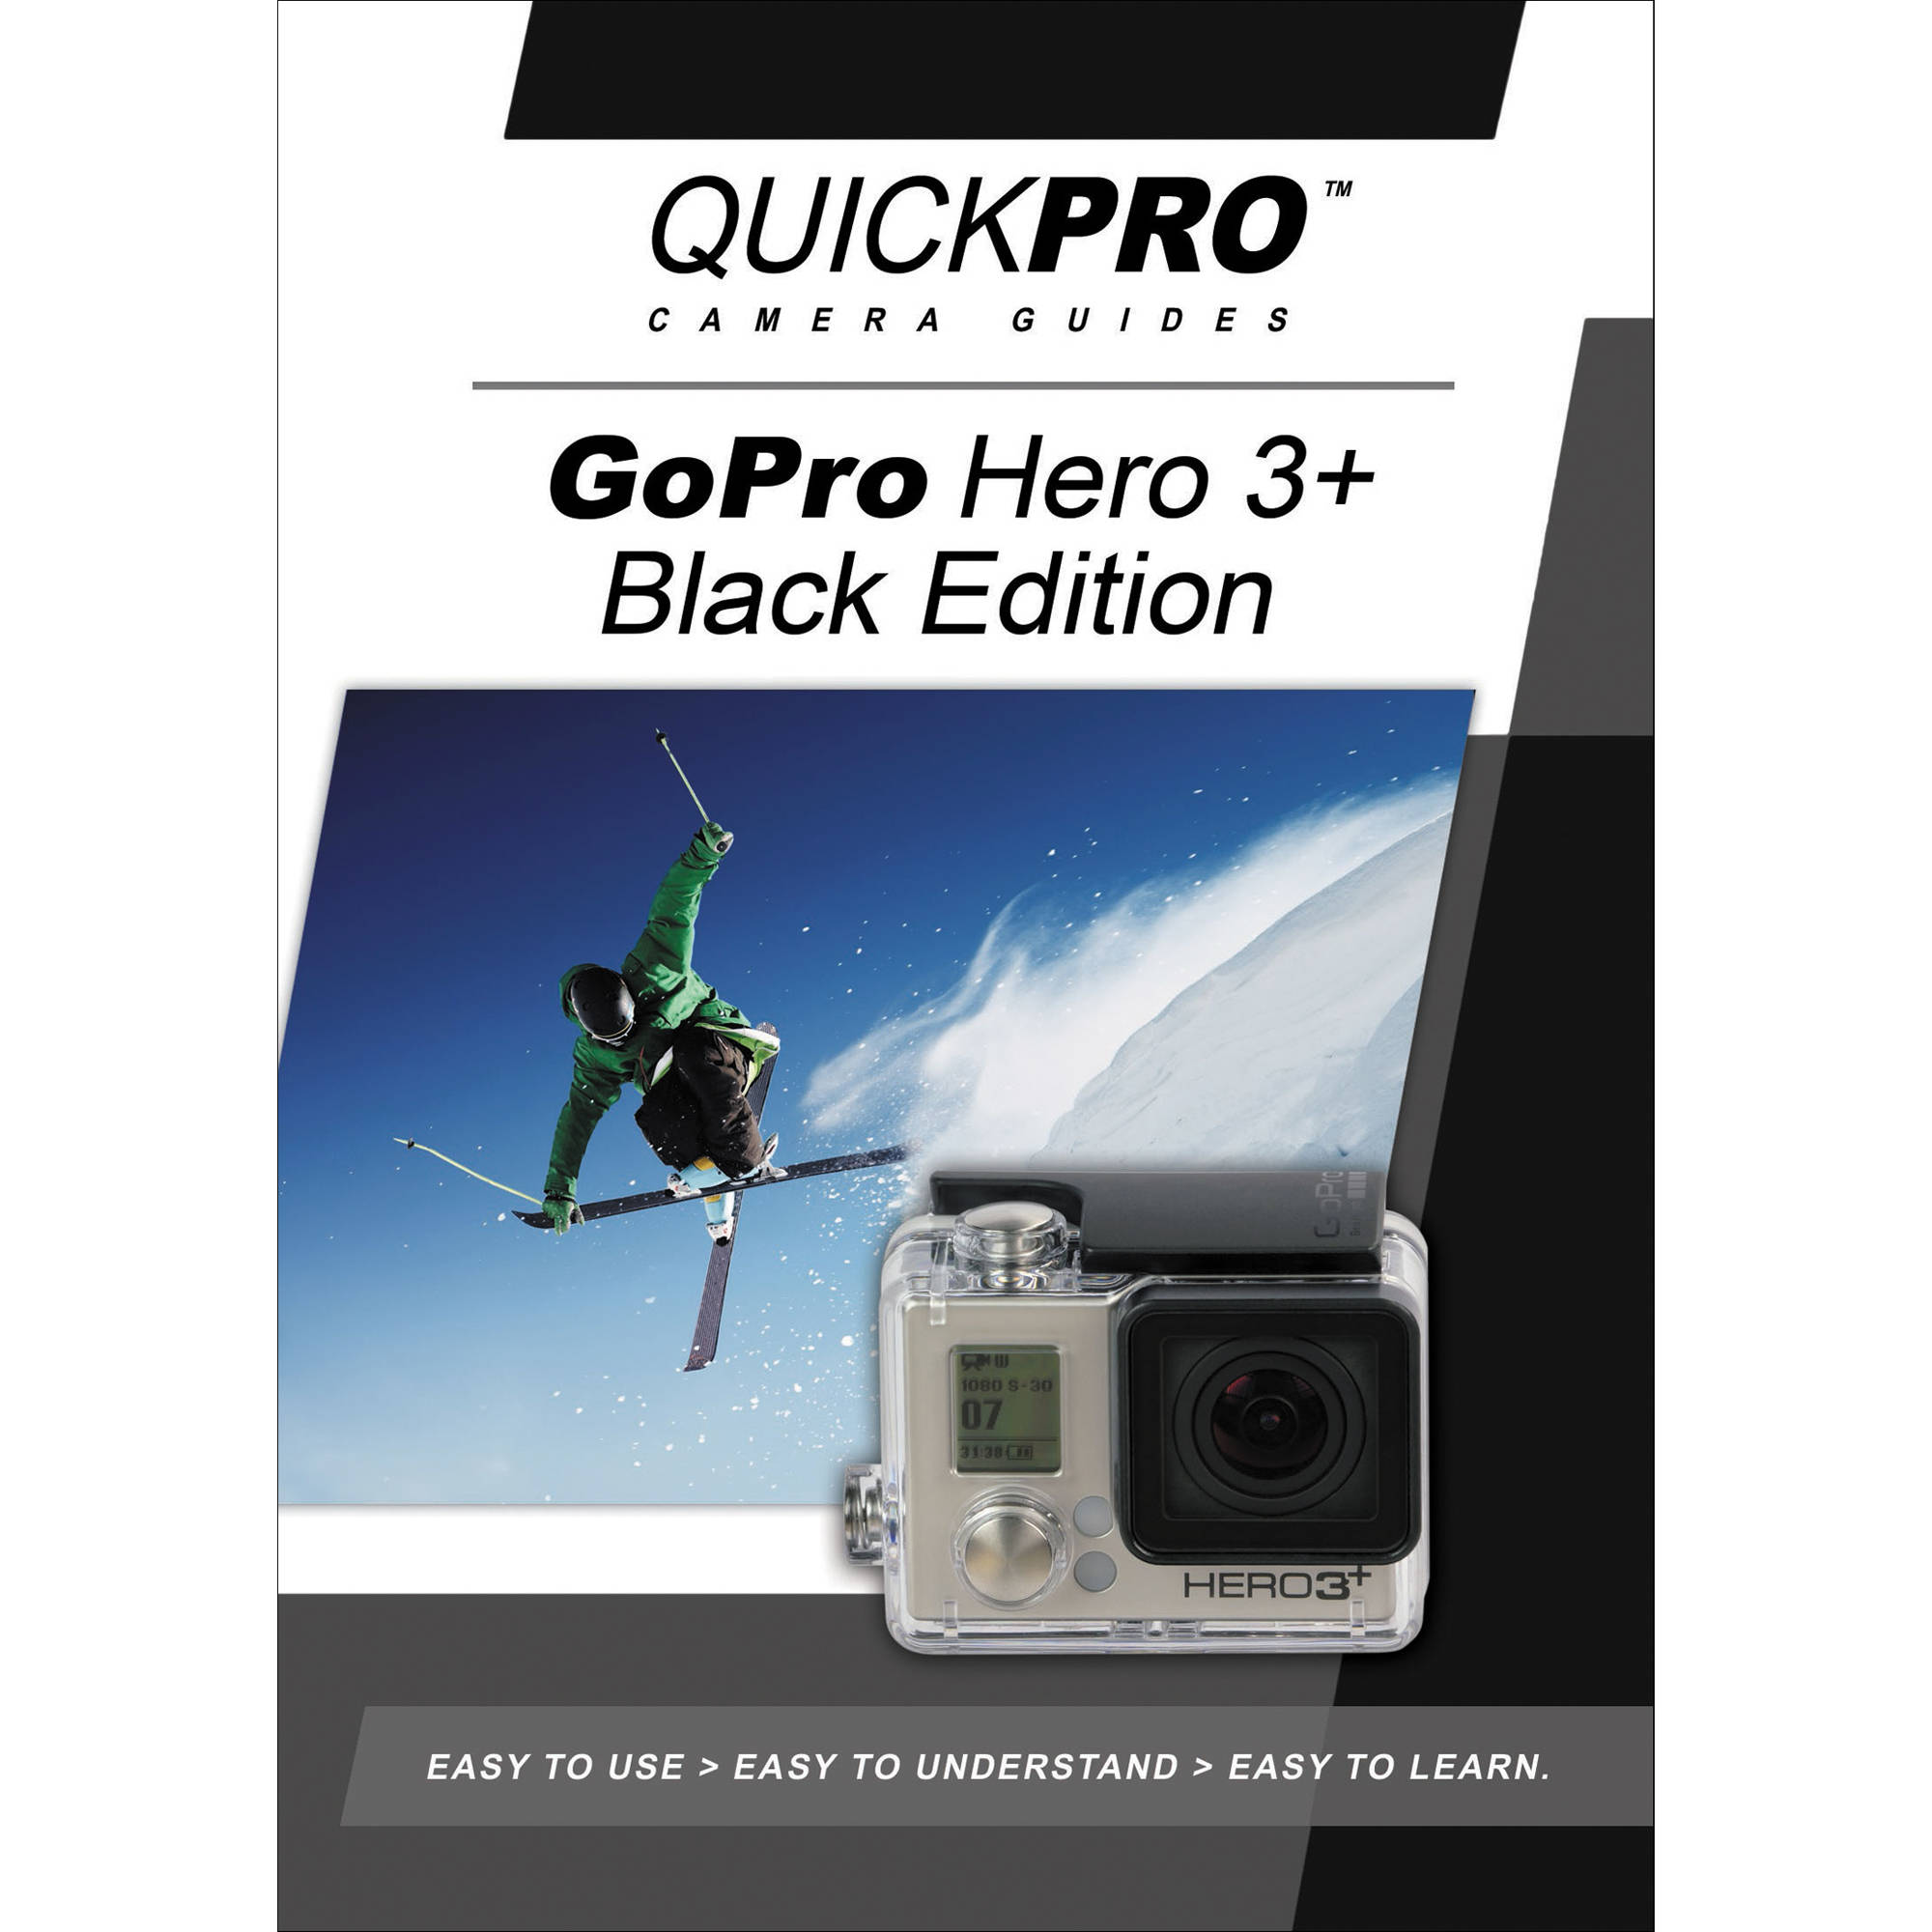 quickpro training dvd gopro hero3 instructional guide. Black Bedroom Furniture Sets. Home Design Ideas